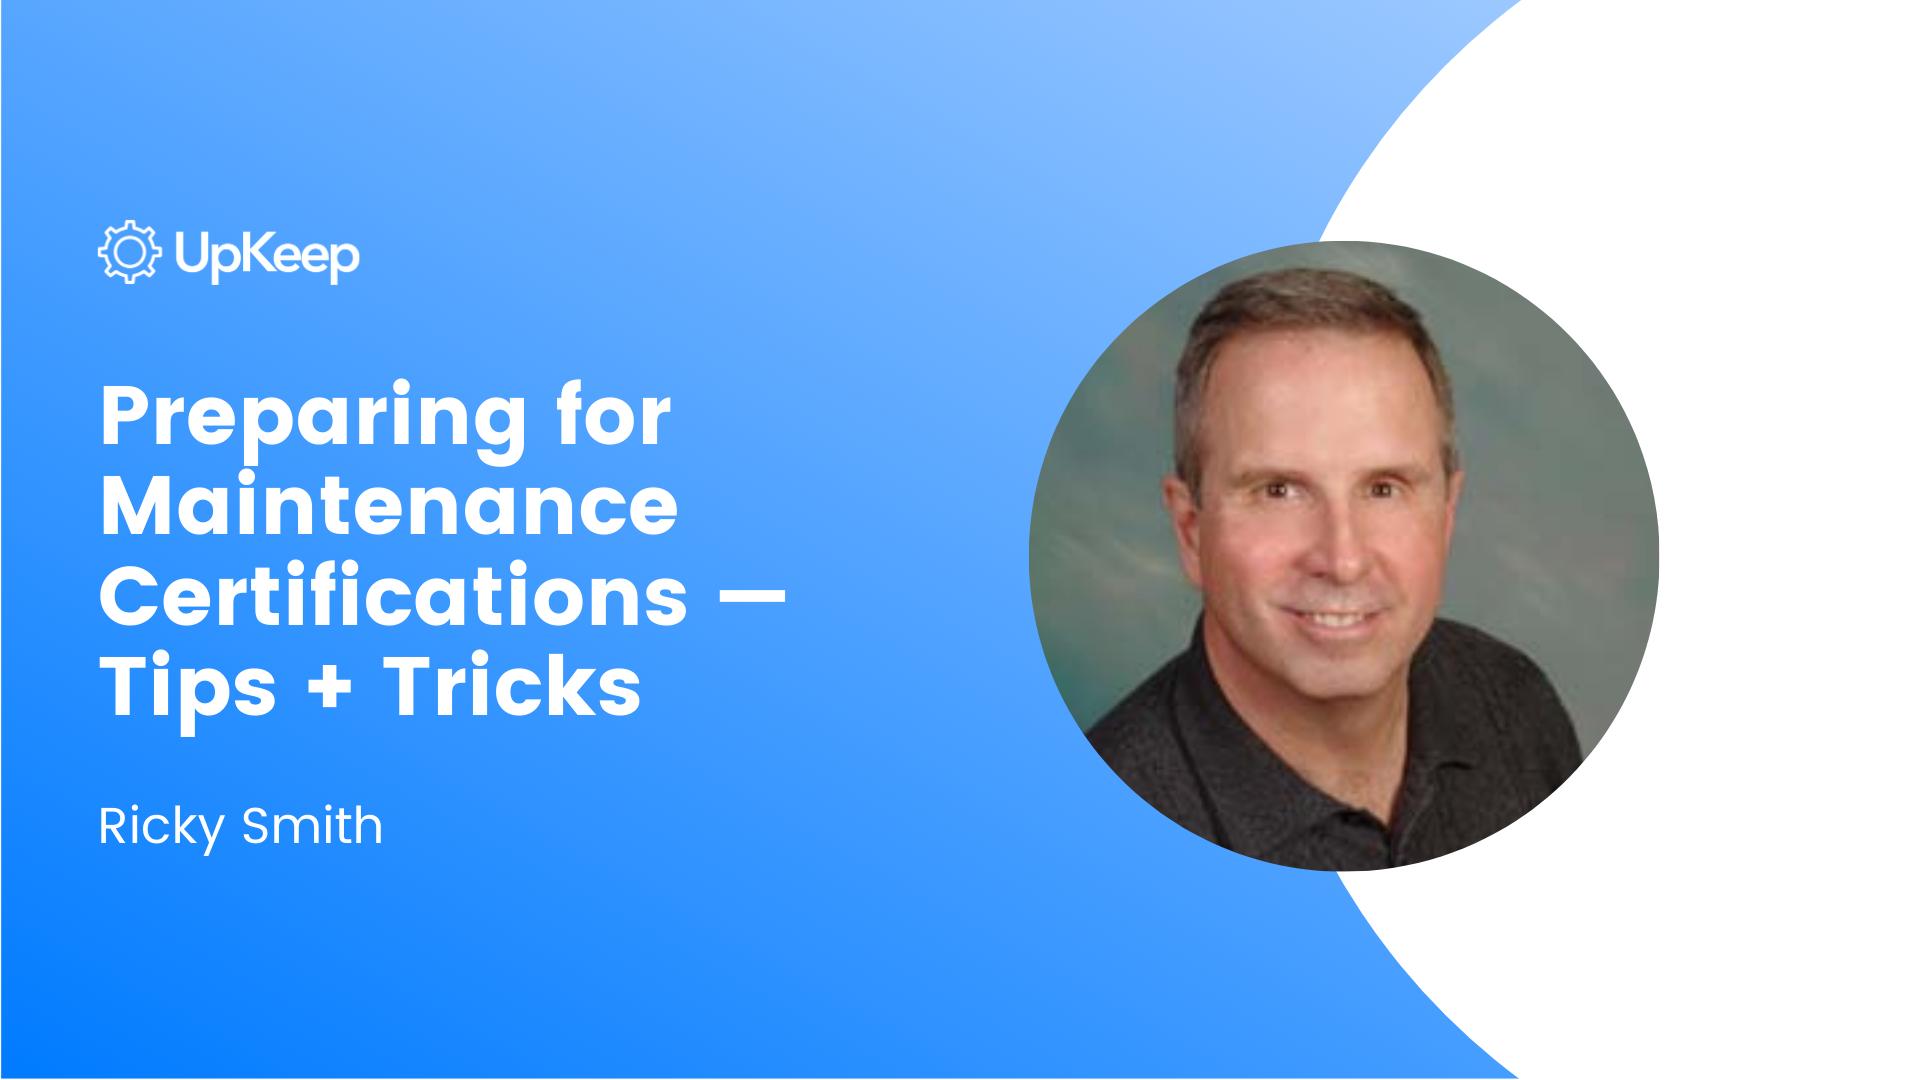 Preparing for Maintenance Certifications - Tips + Tricks